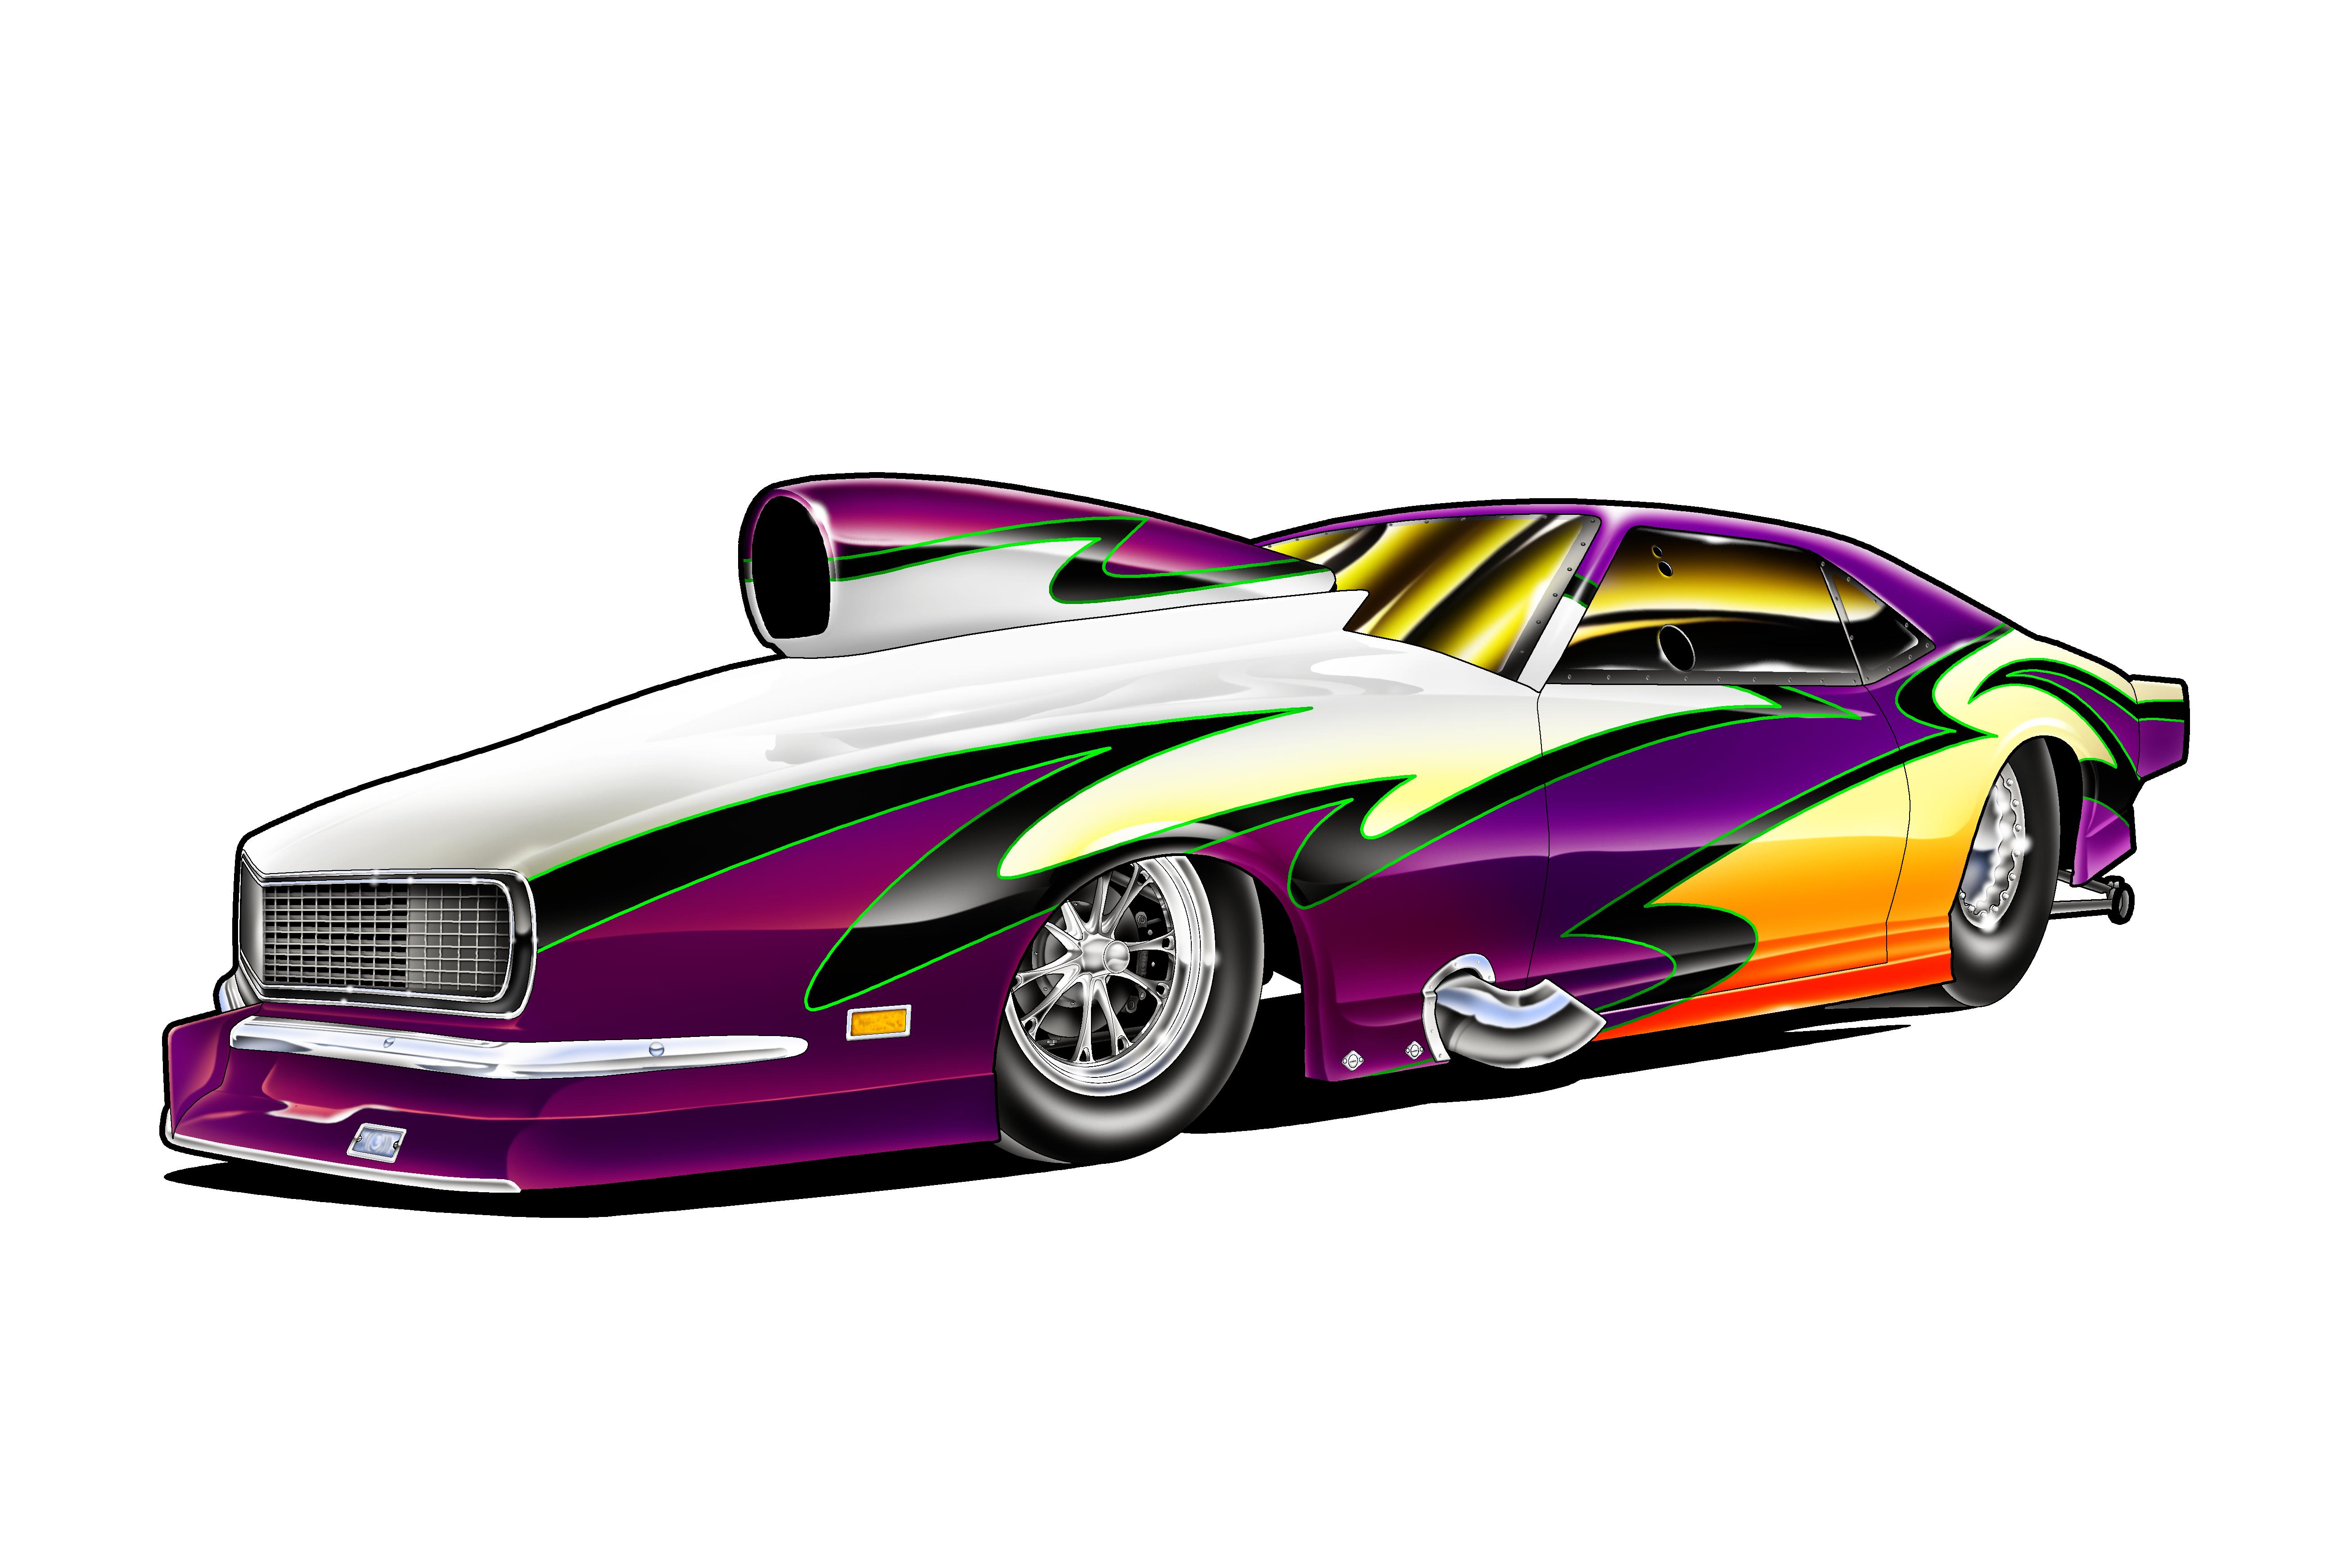 Camaro graphics